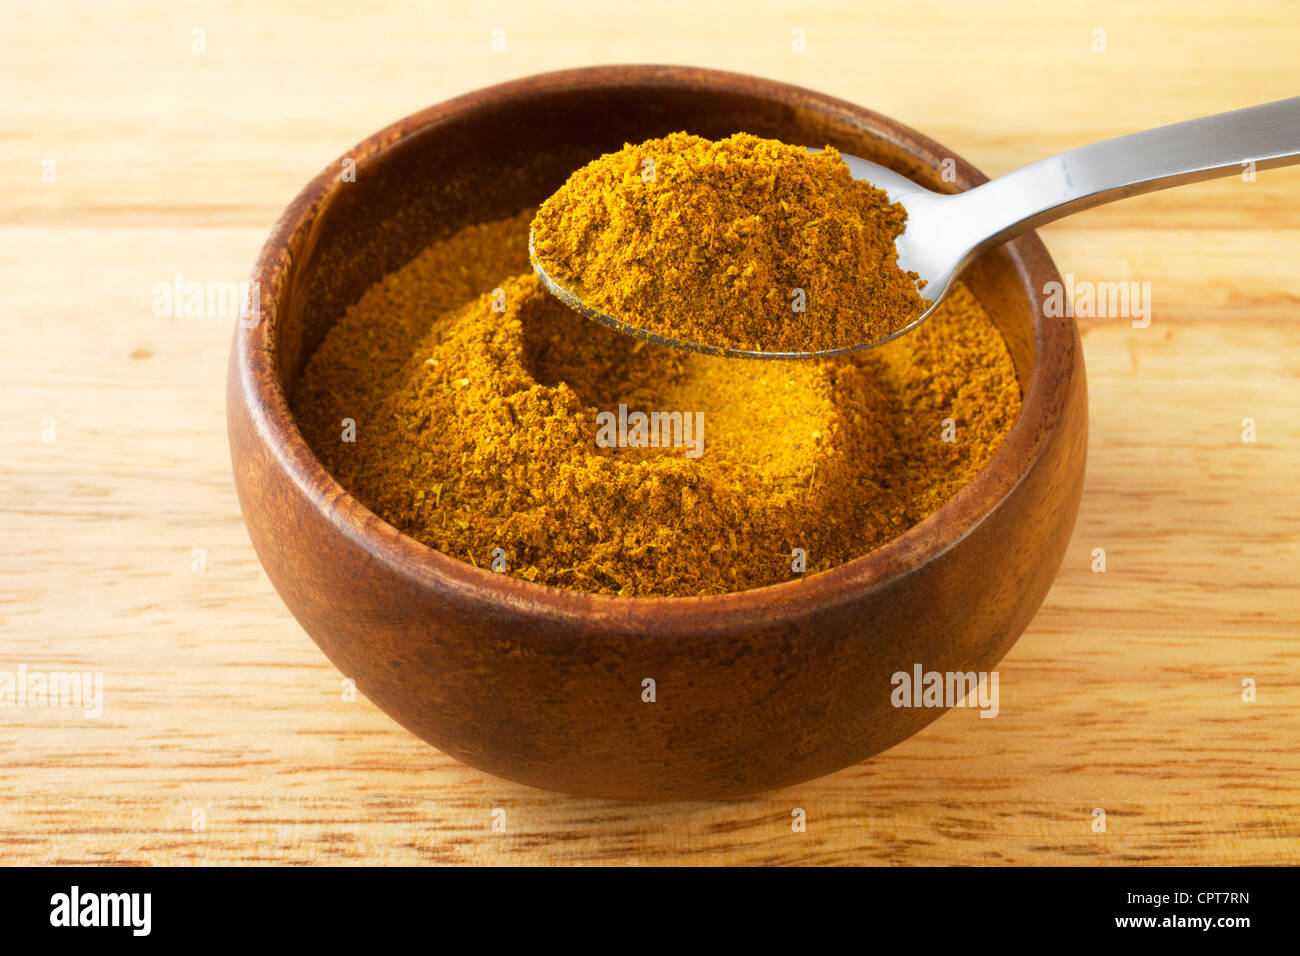 Mezcla de especias marroquí de Ras el hanout, Imagen De Stock